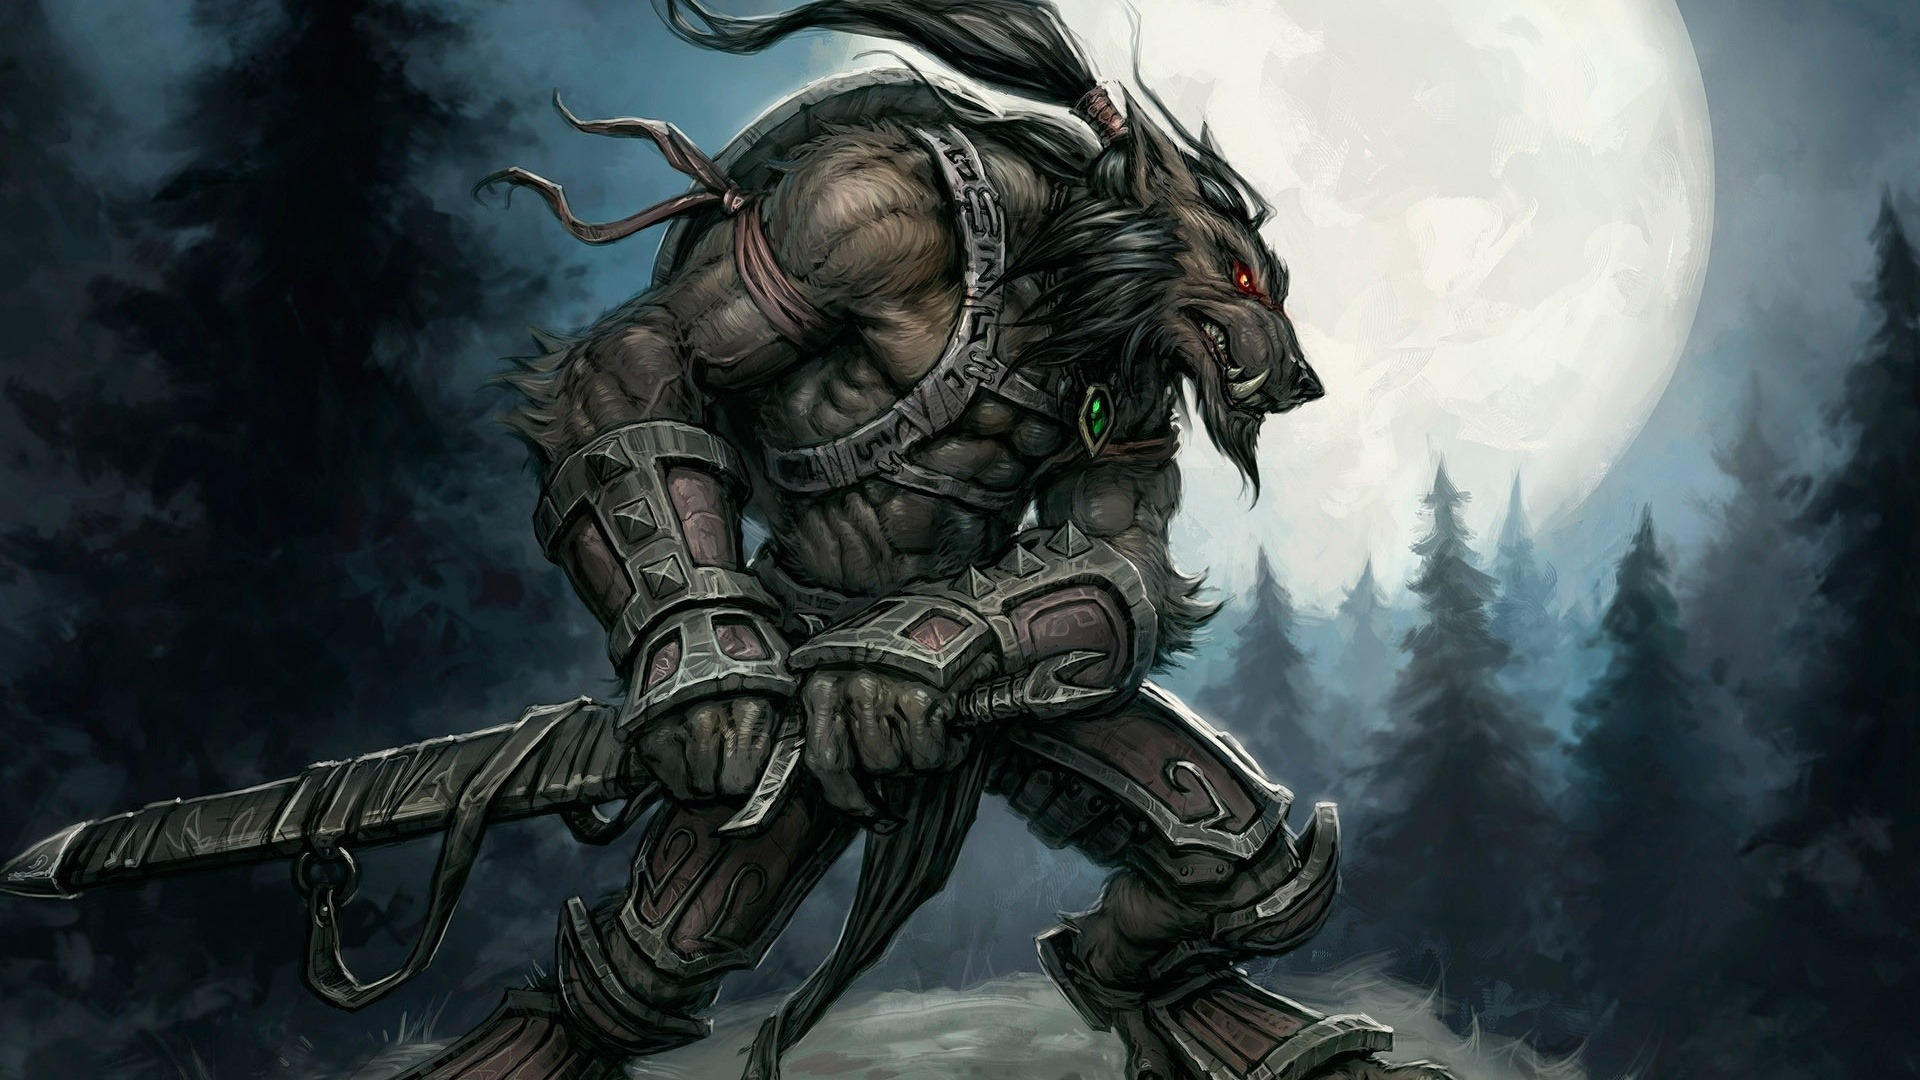 Werewolf 1080p wallpaper